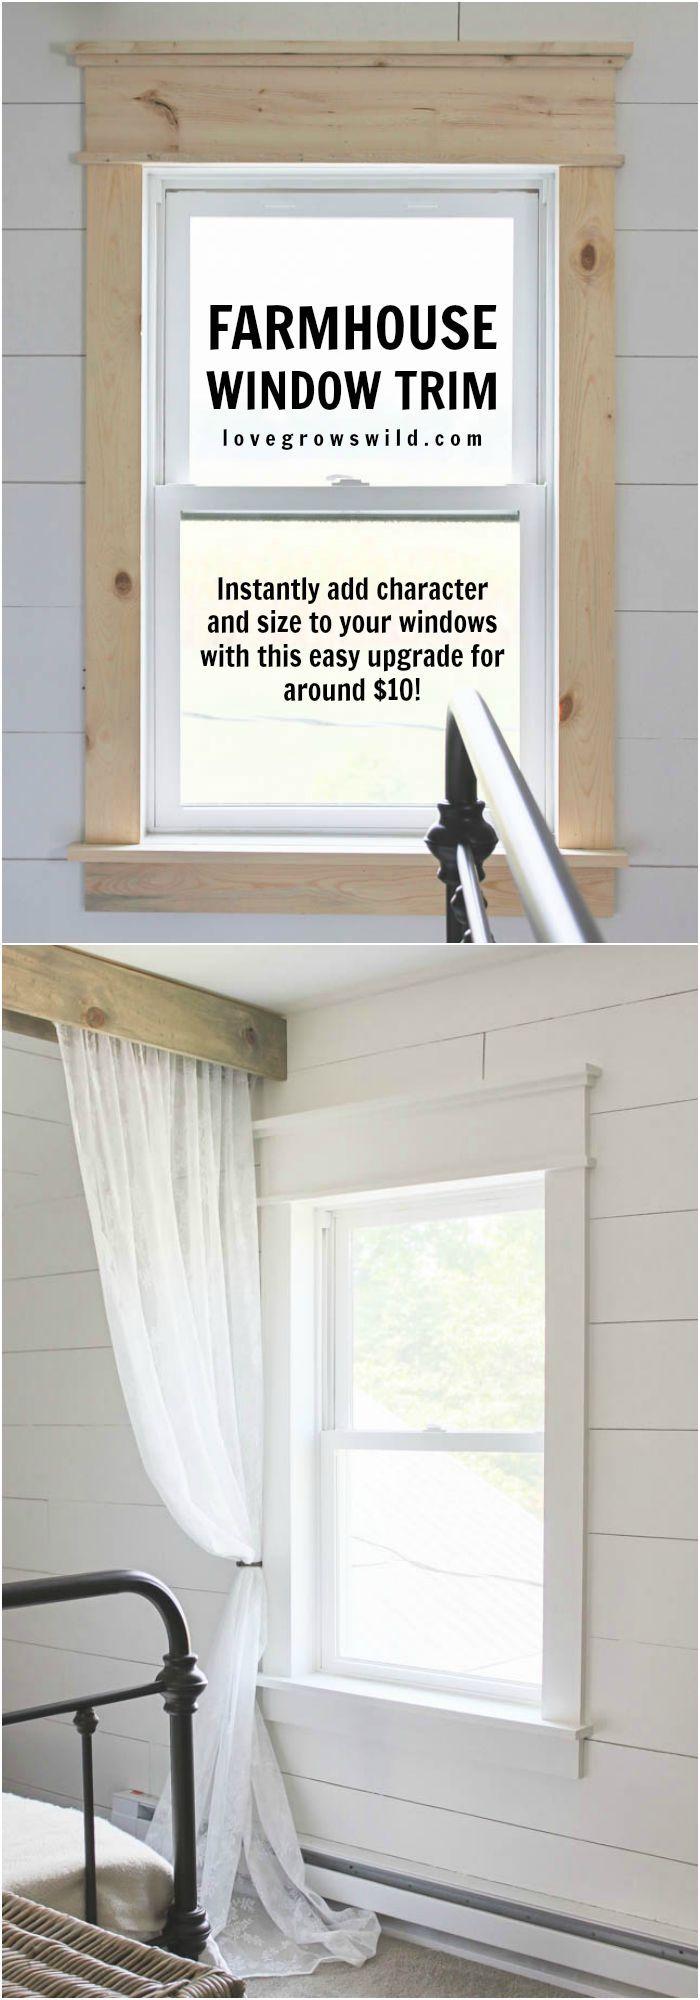 Farmhouse Window Trim Home, Renovation, Home remodeling